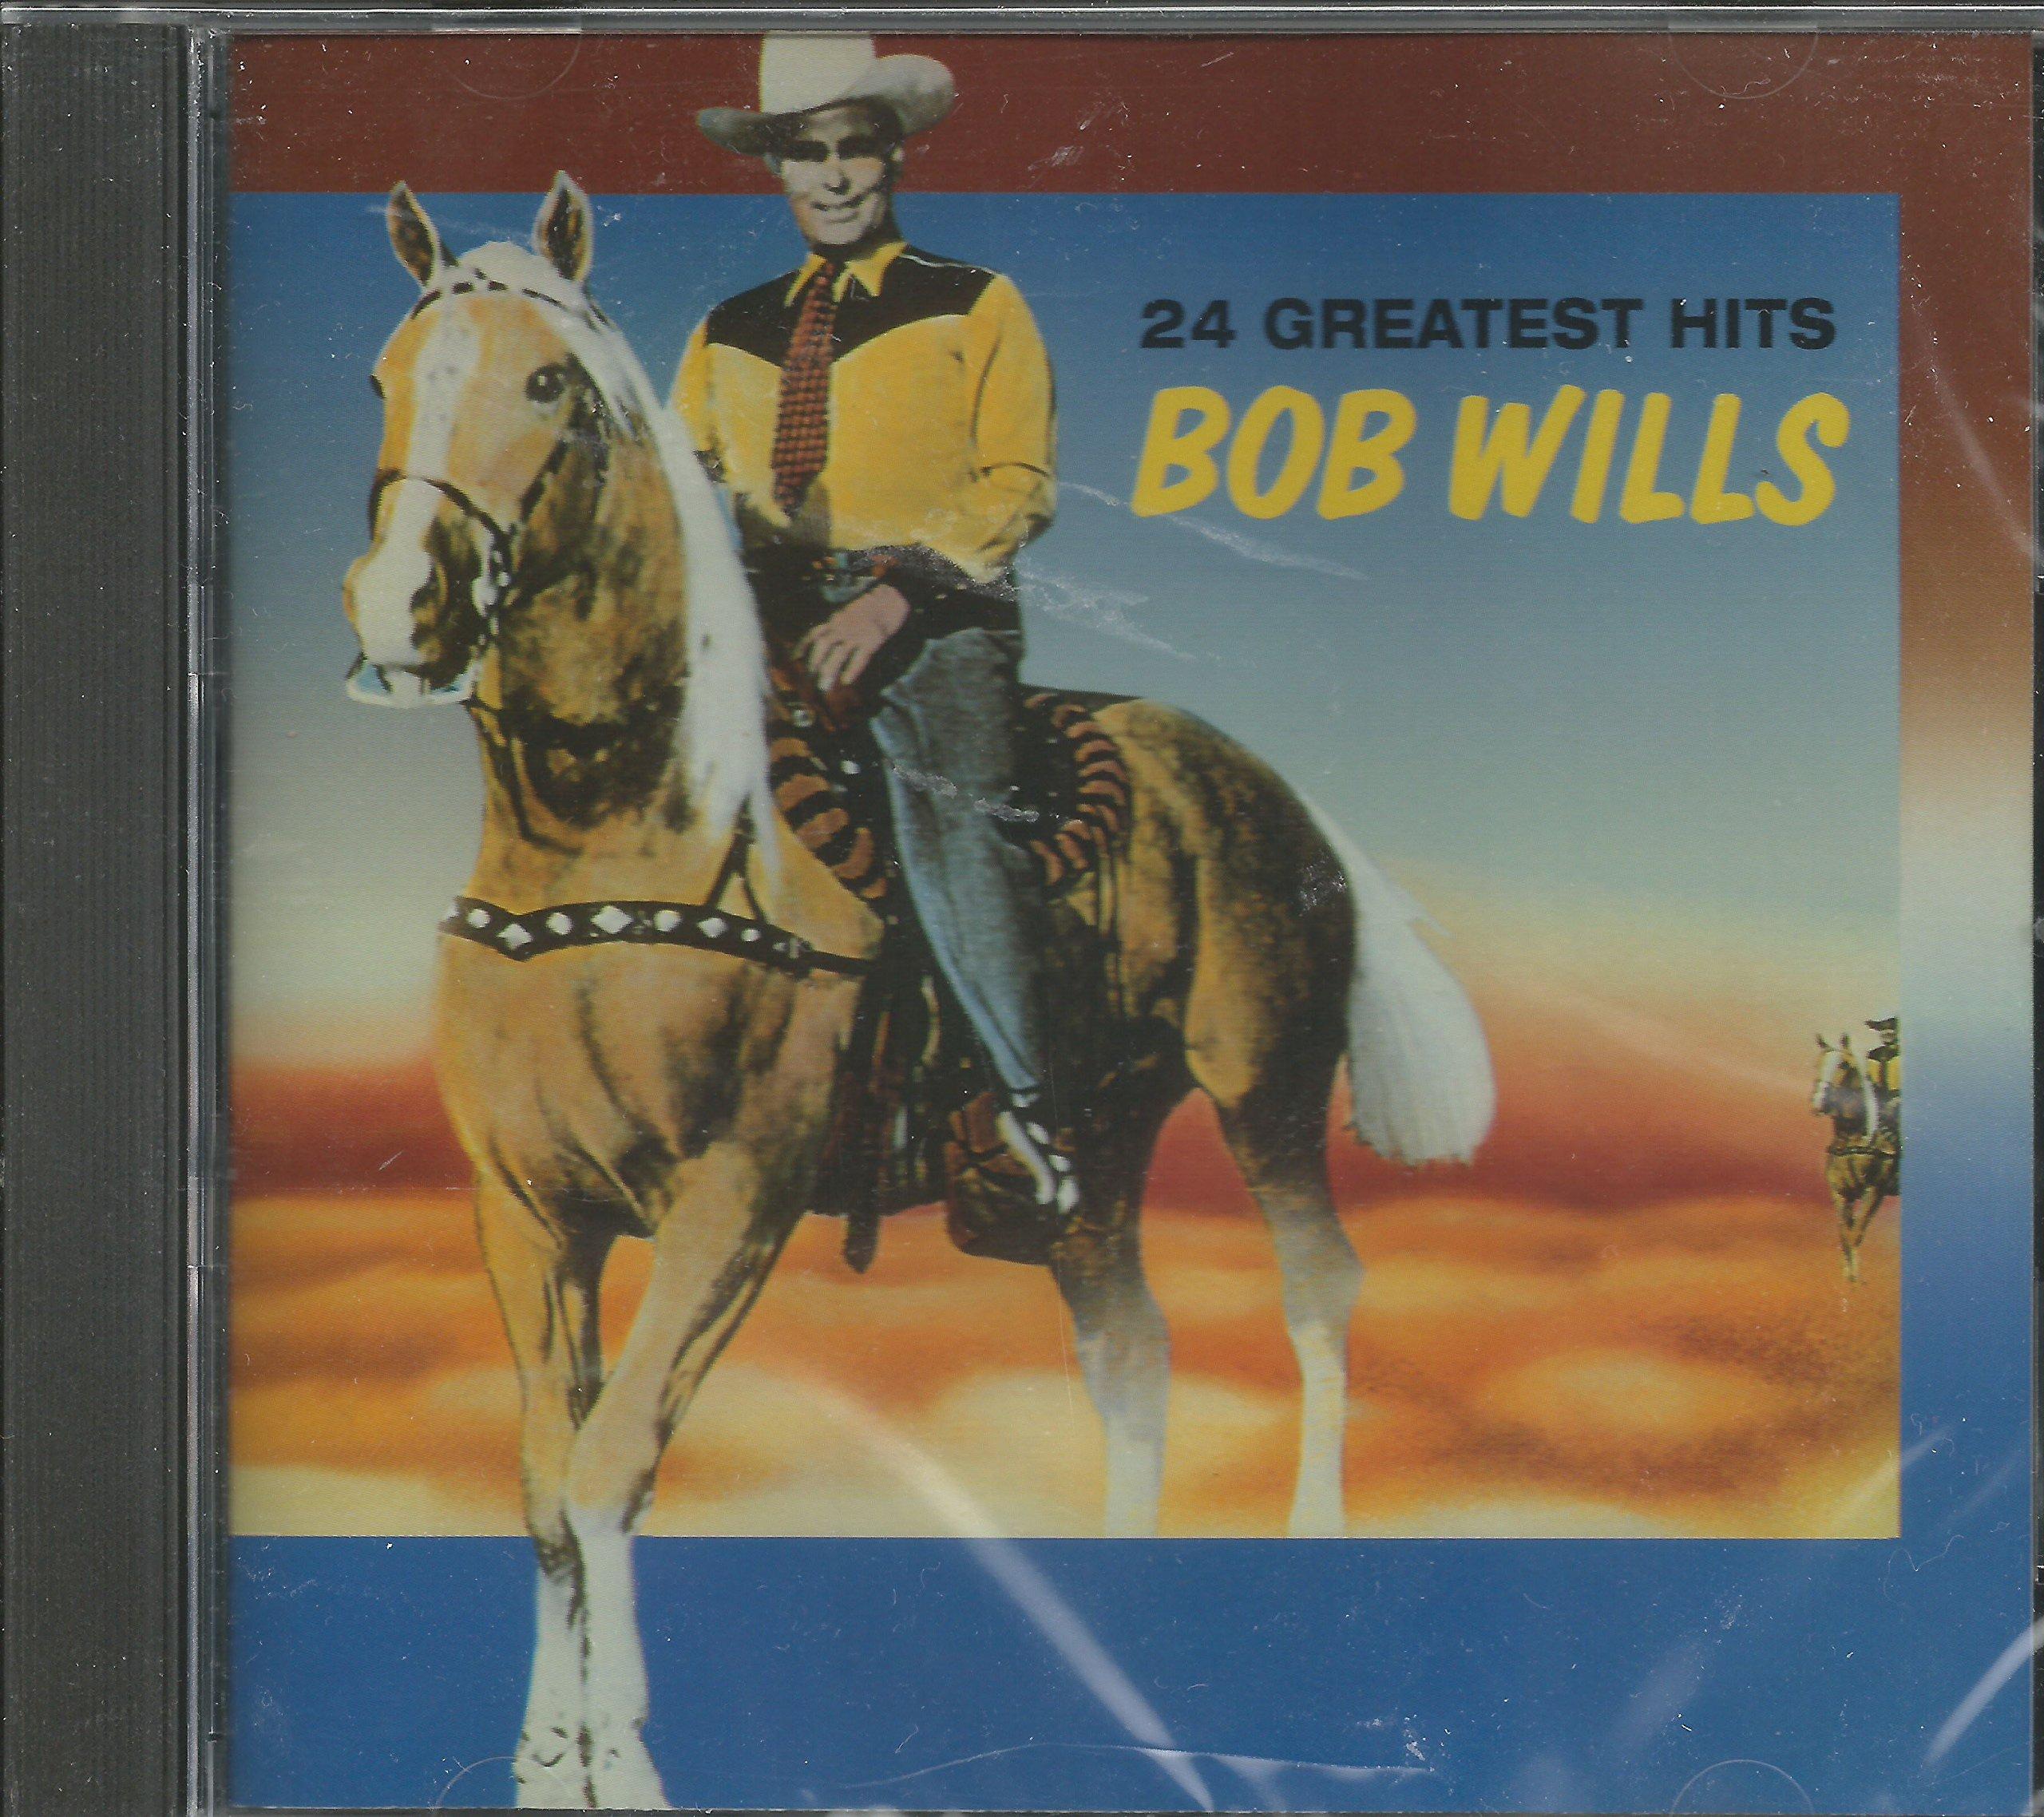 Bob Wills & His Texas Playboys - 24 Greatest Hits